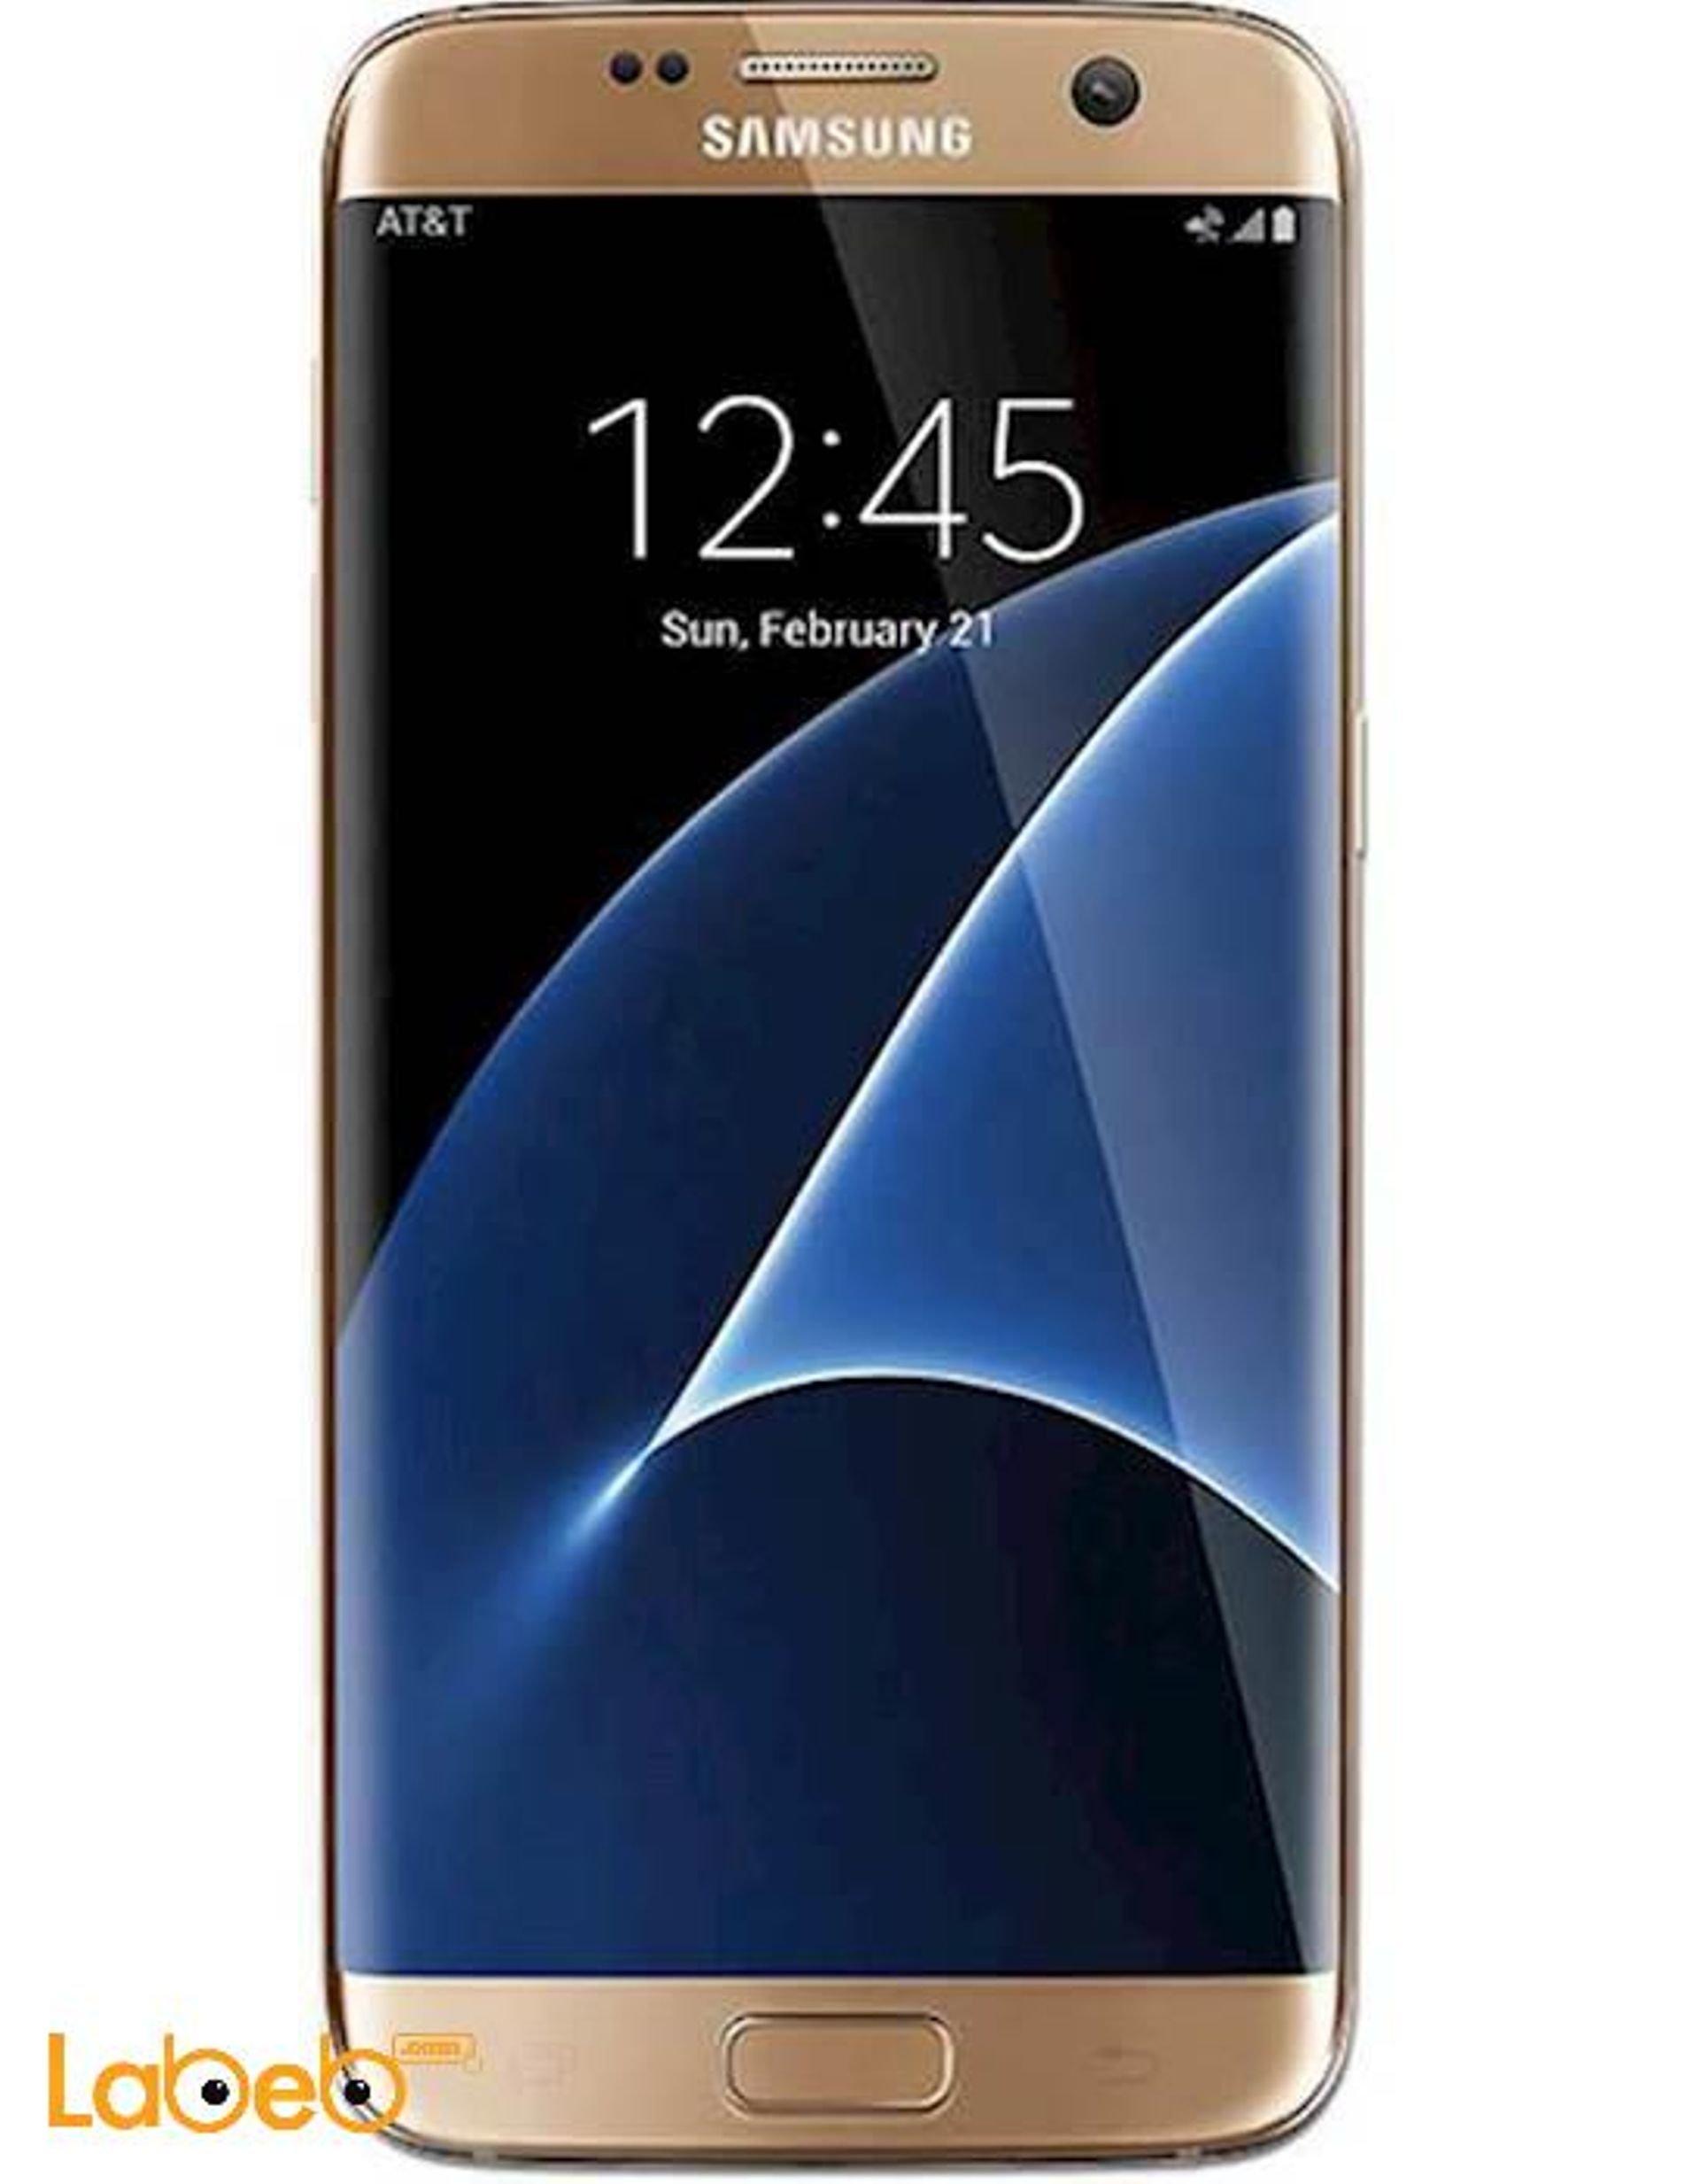 fec14270d920a موبايل سامسونج جلاكسي S7 ادج، ذهبي، ذاكرة 32GB